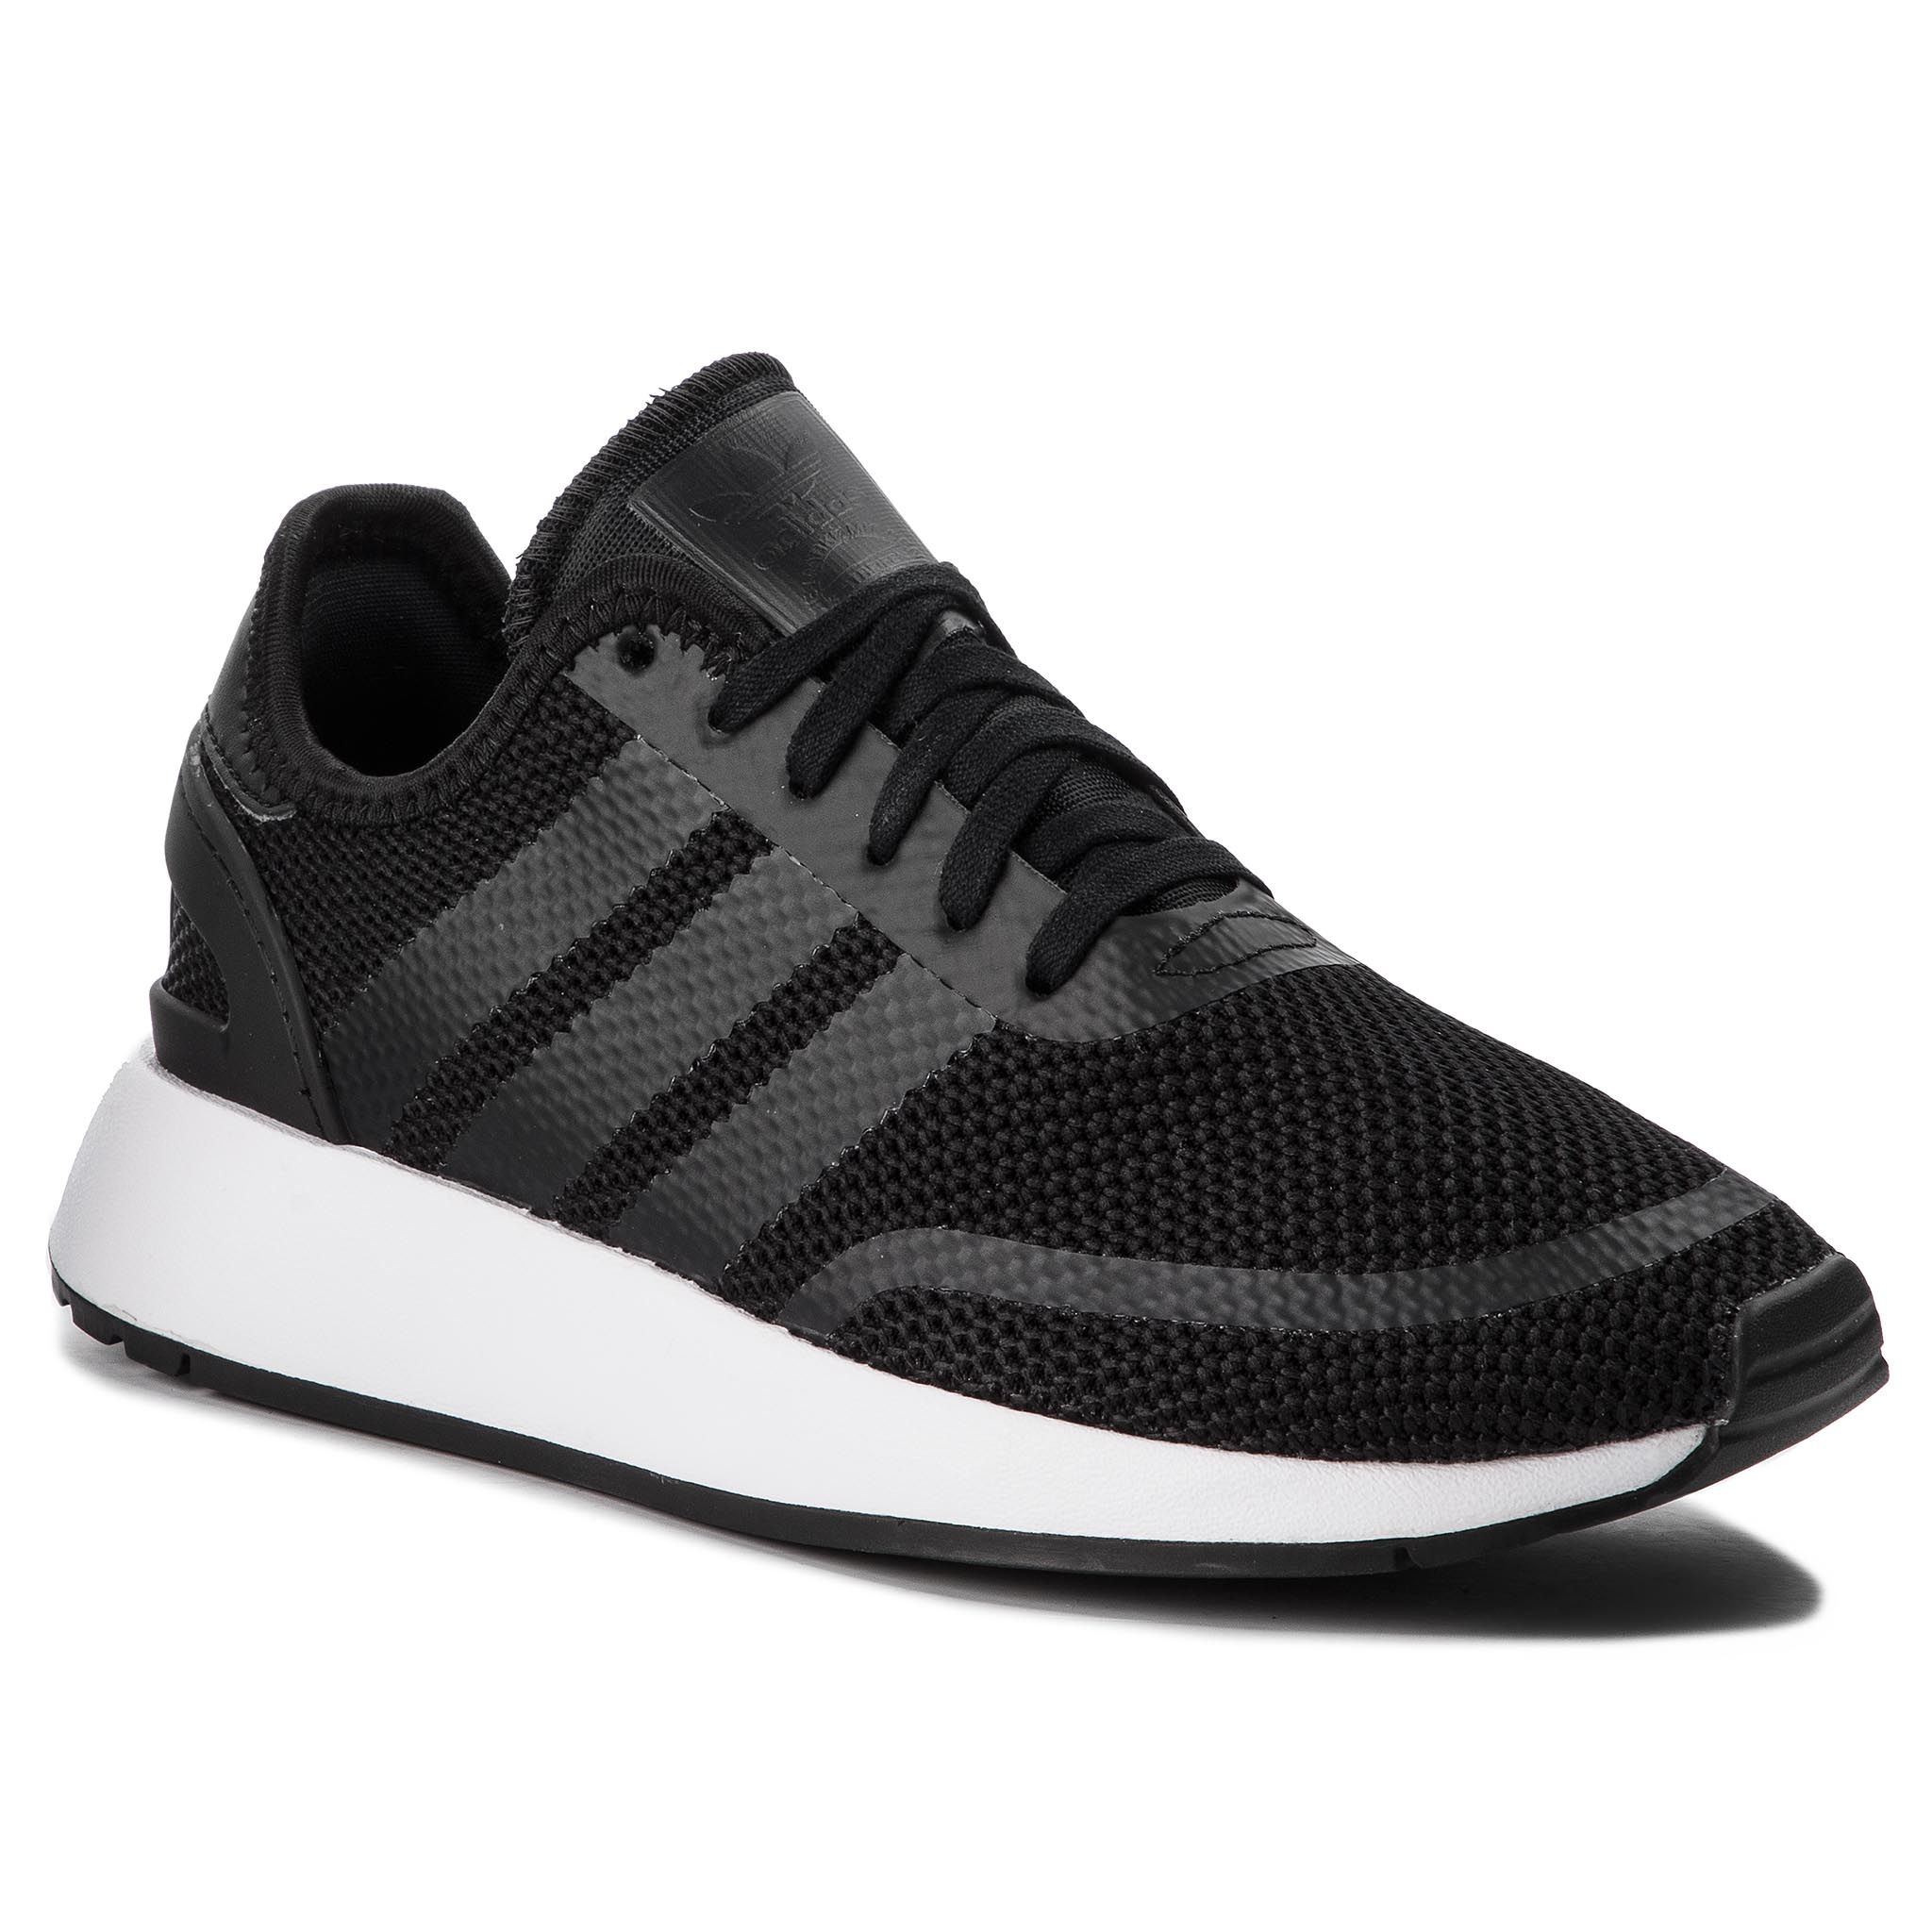 d179cf857eb Shoes adidas - Duramo 9 K BB7061 Cblack/Ftwwht/Cblack - Indoor ...